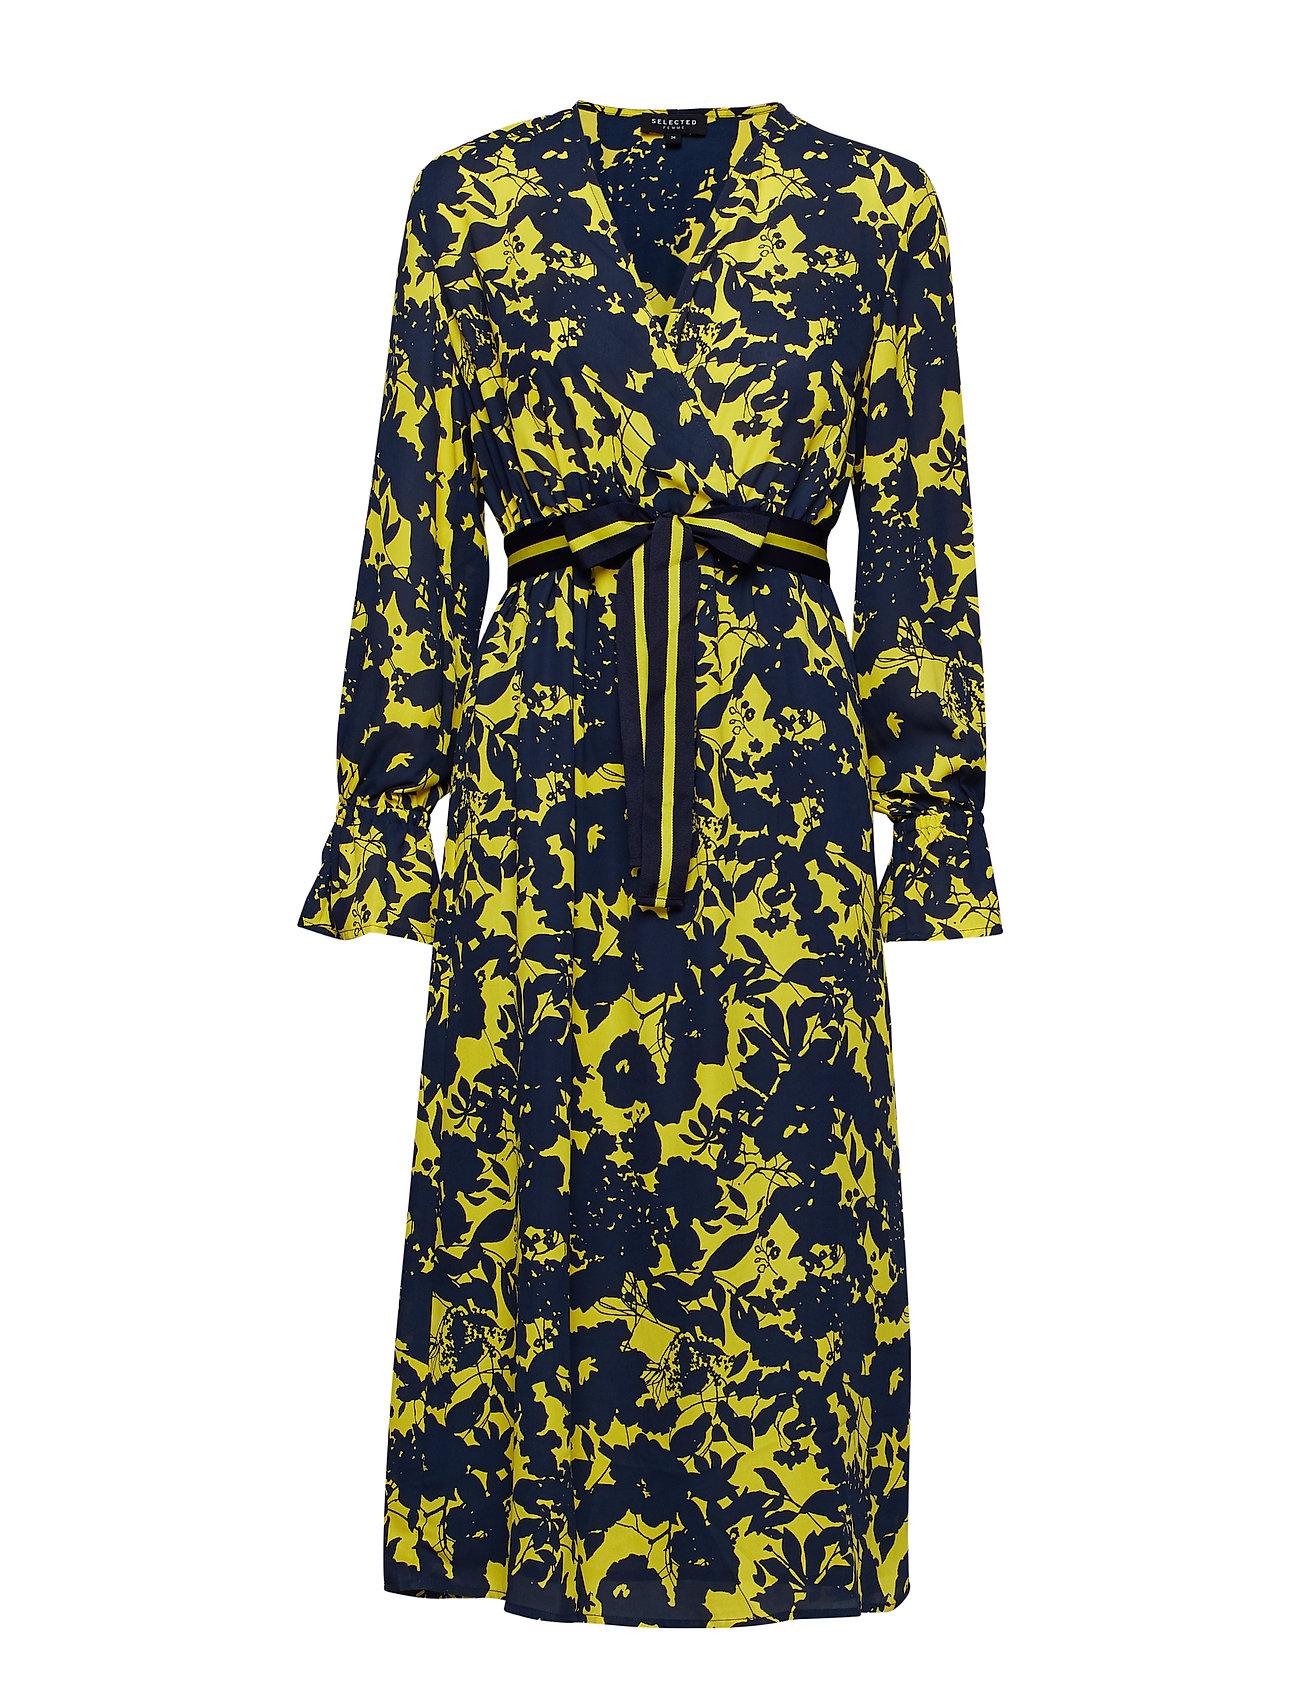 low priced bb9a0 f69d0 30% Sale Slfdesiree Cecilie Ls Dress Ex Kleid Knielang Gelb ...